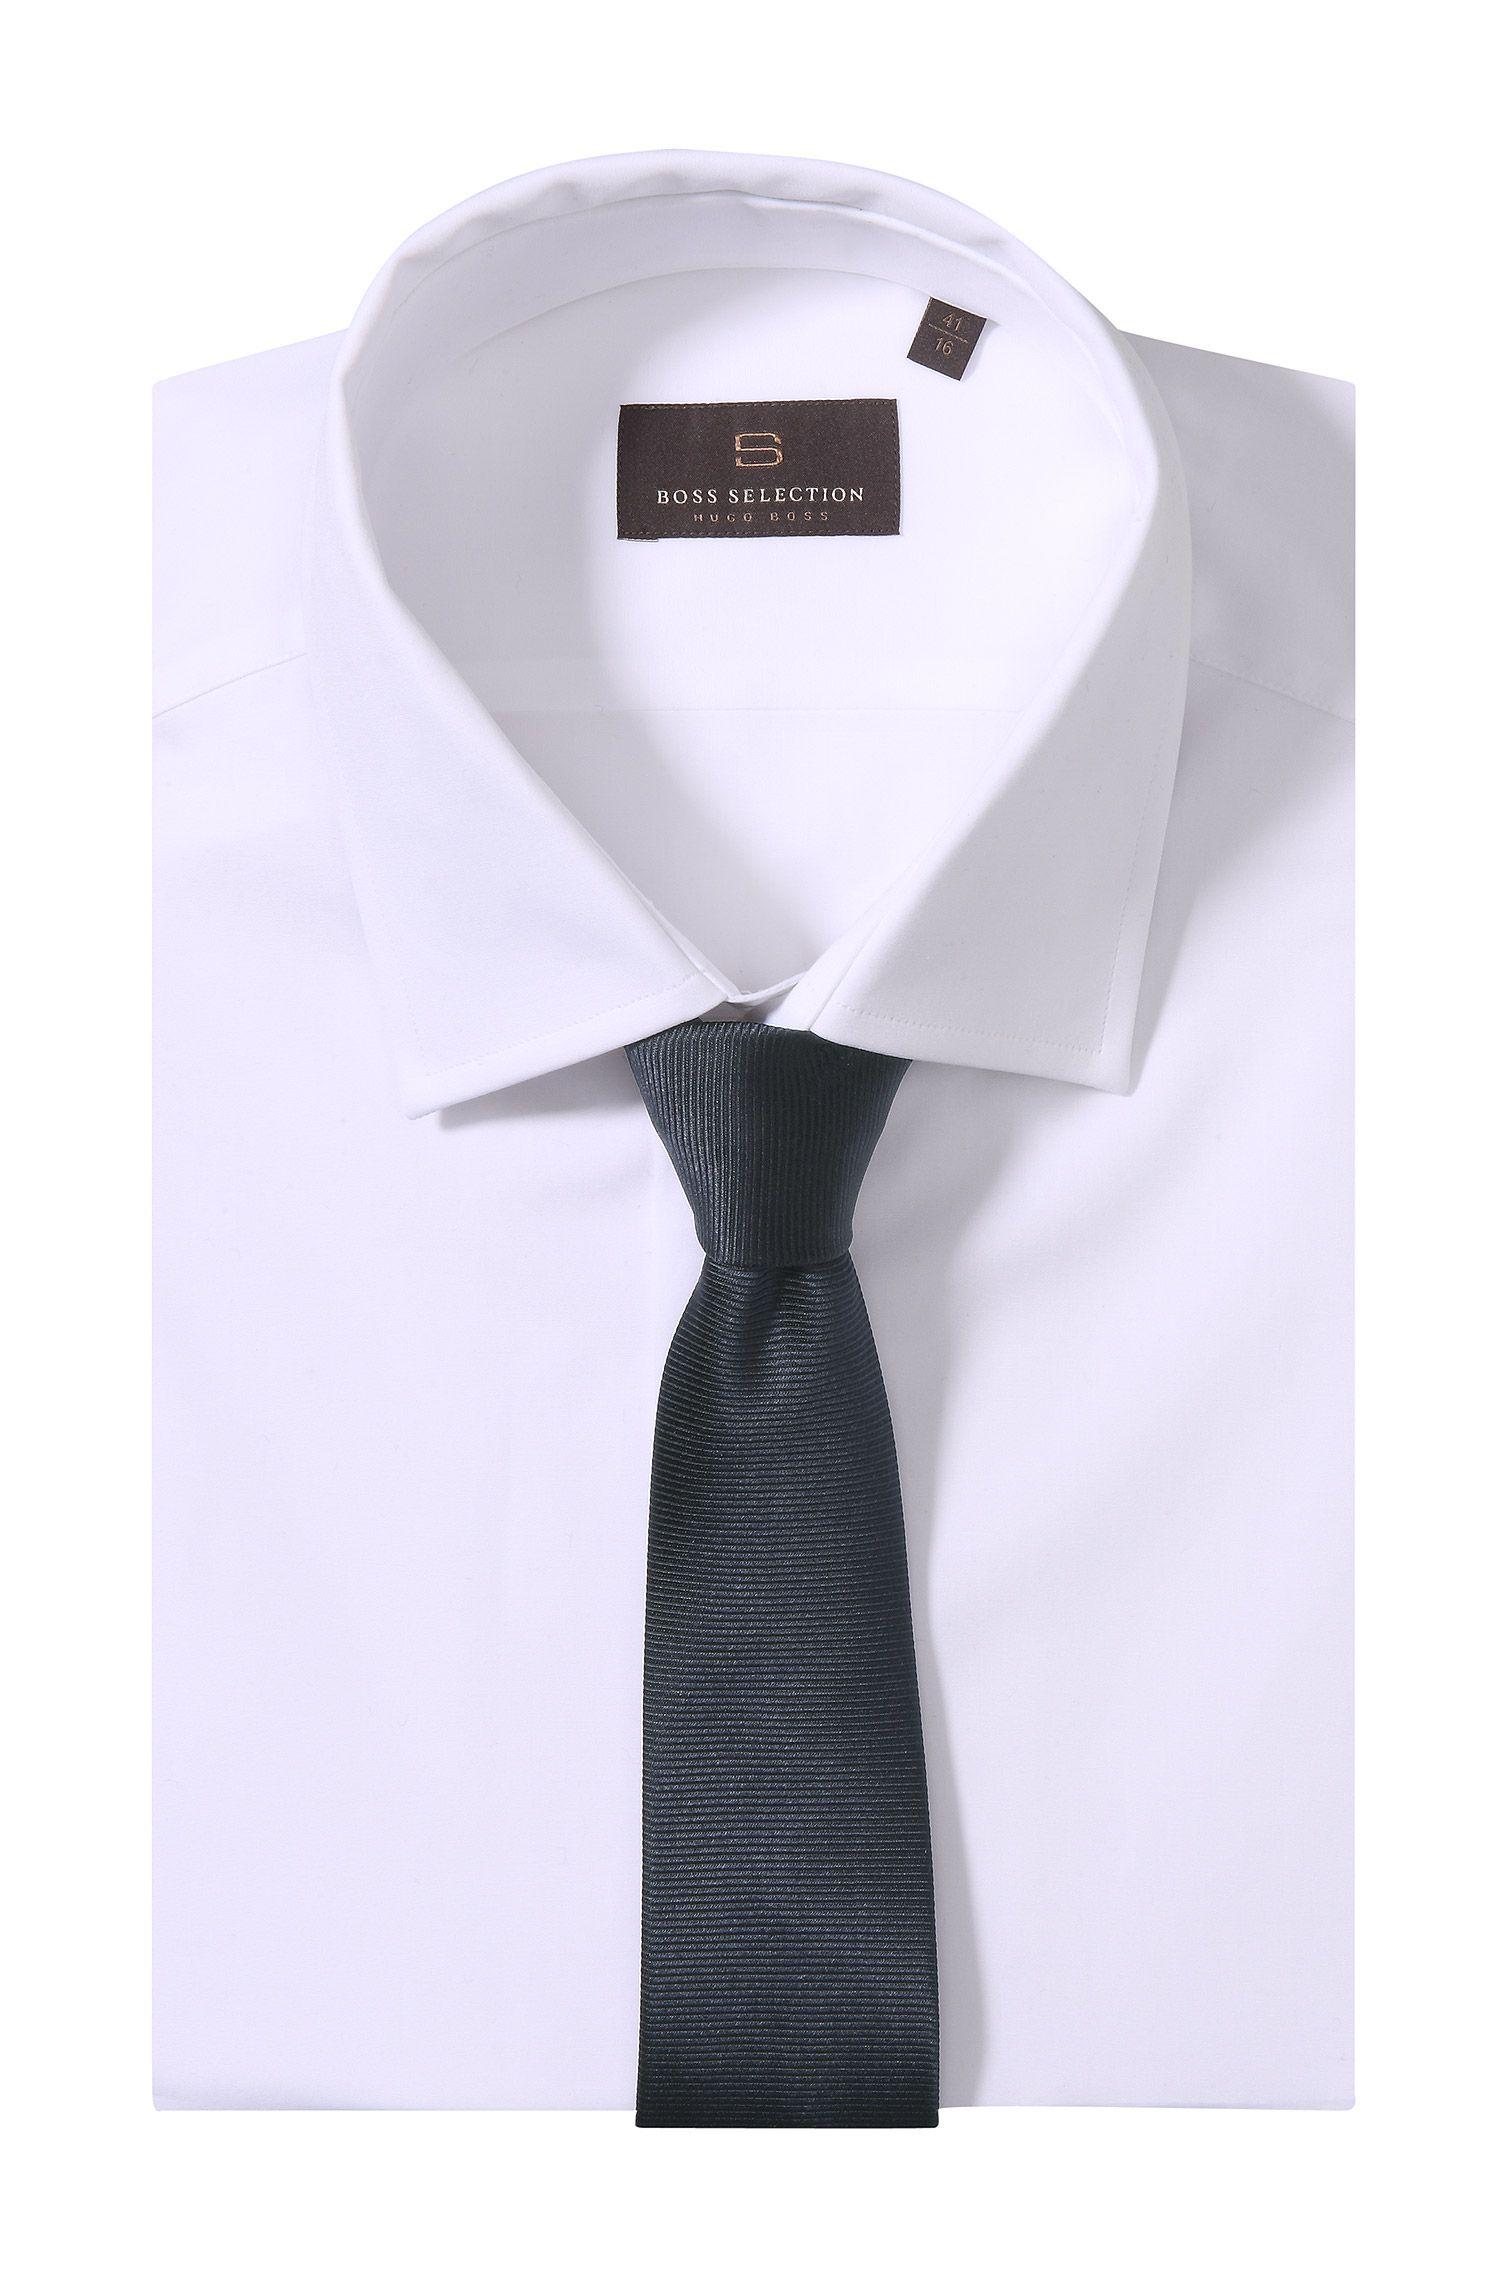 Cravate en soie à rayures horizontales, Tie 6cm